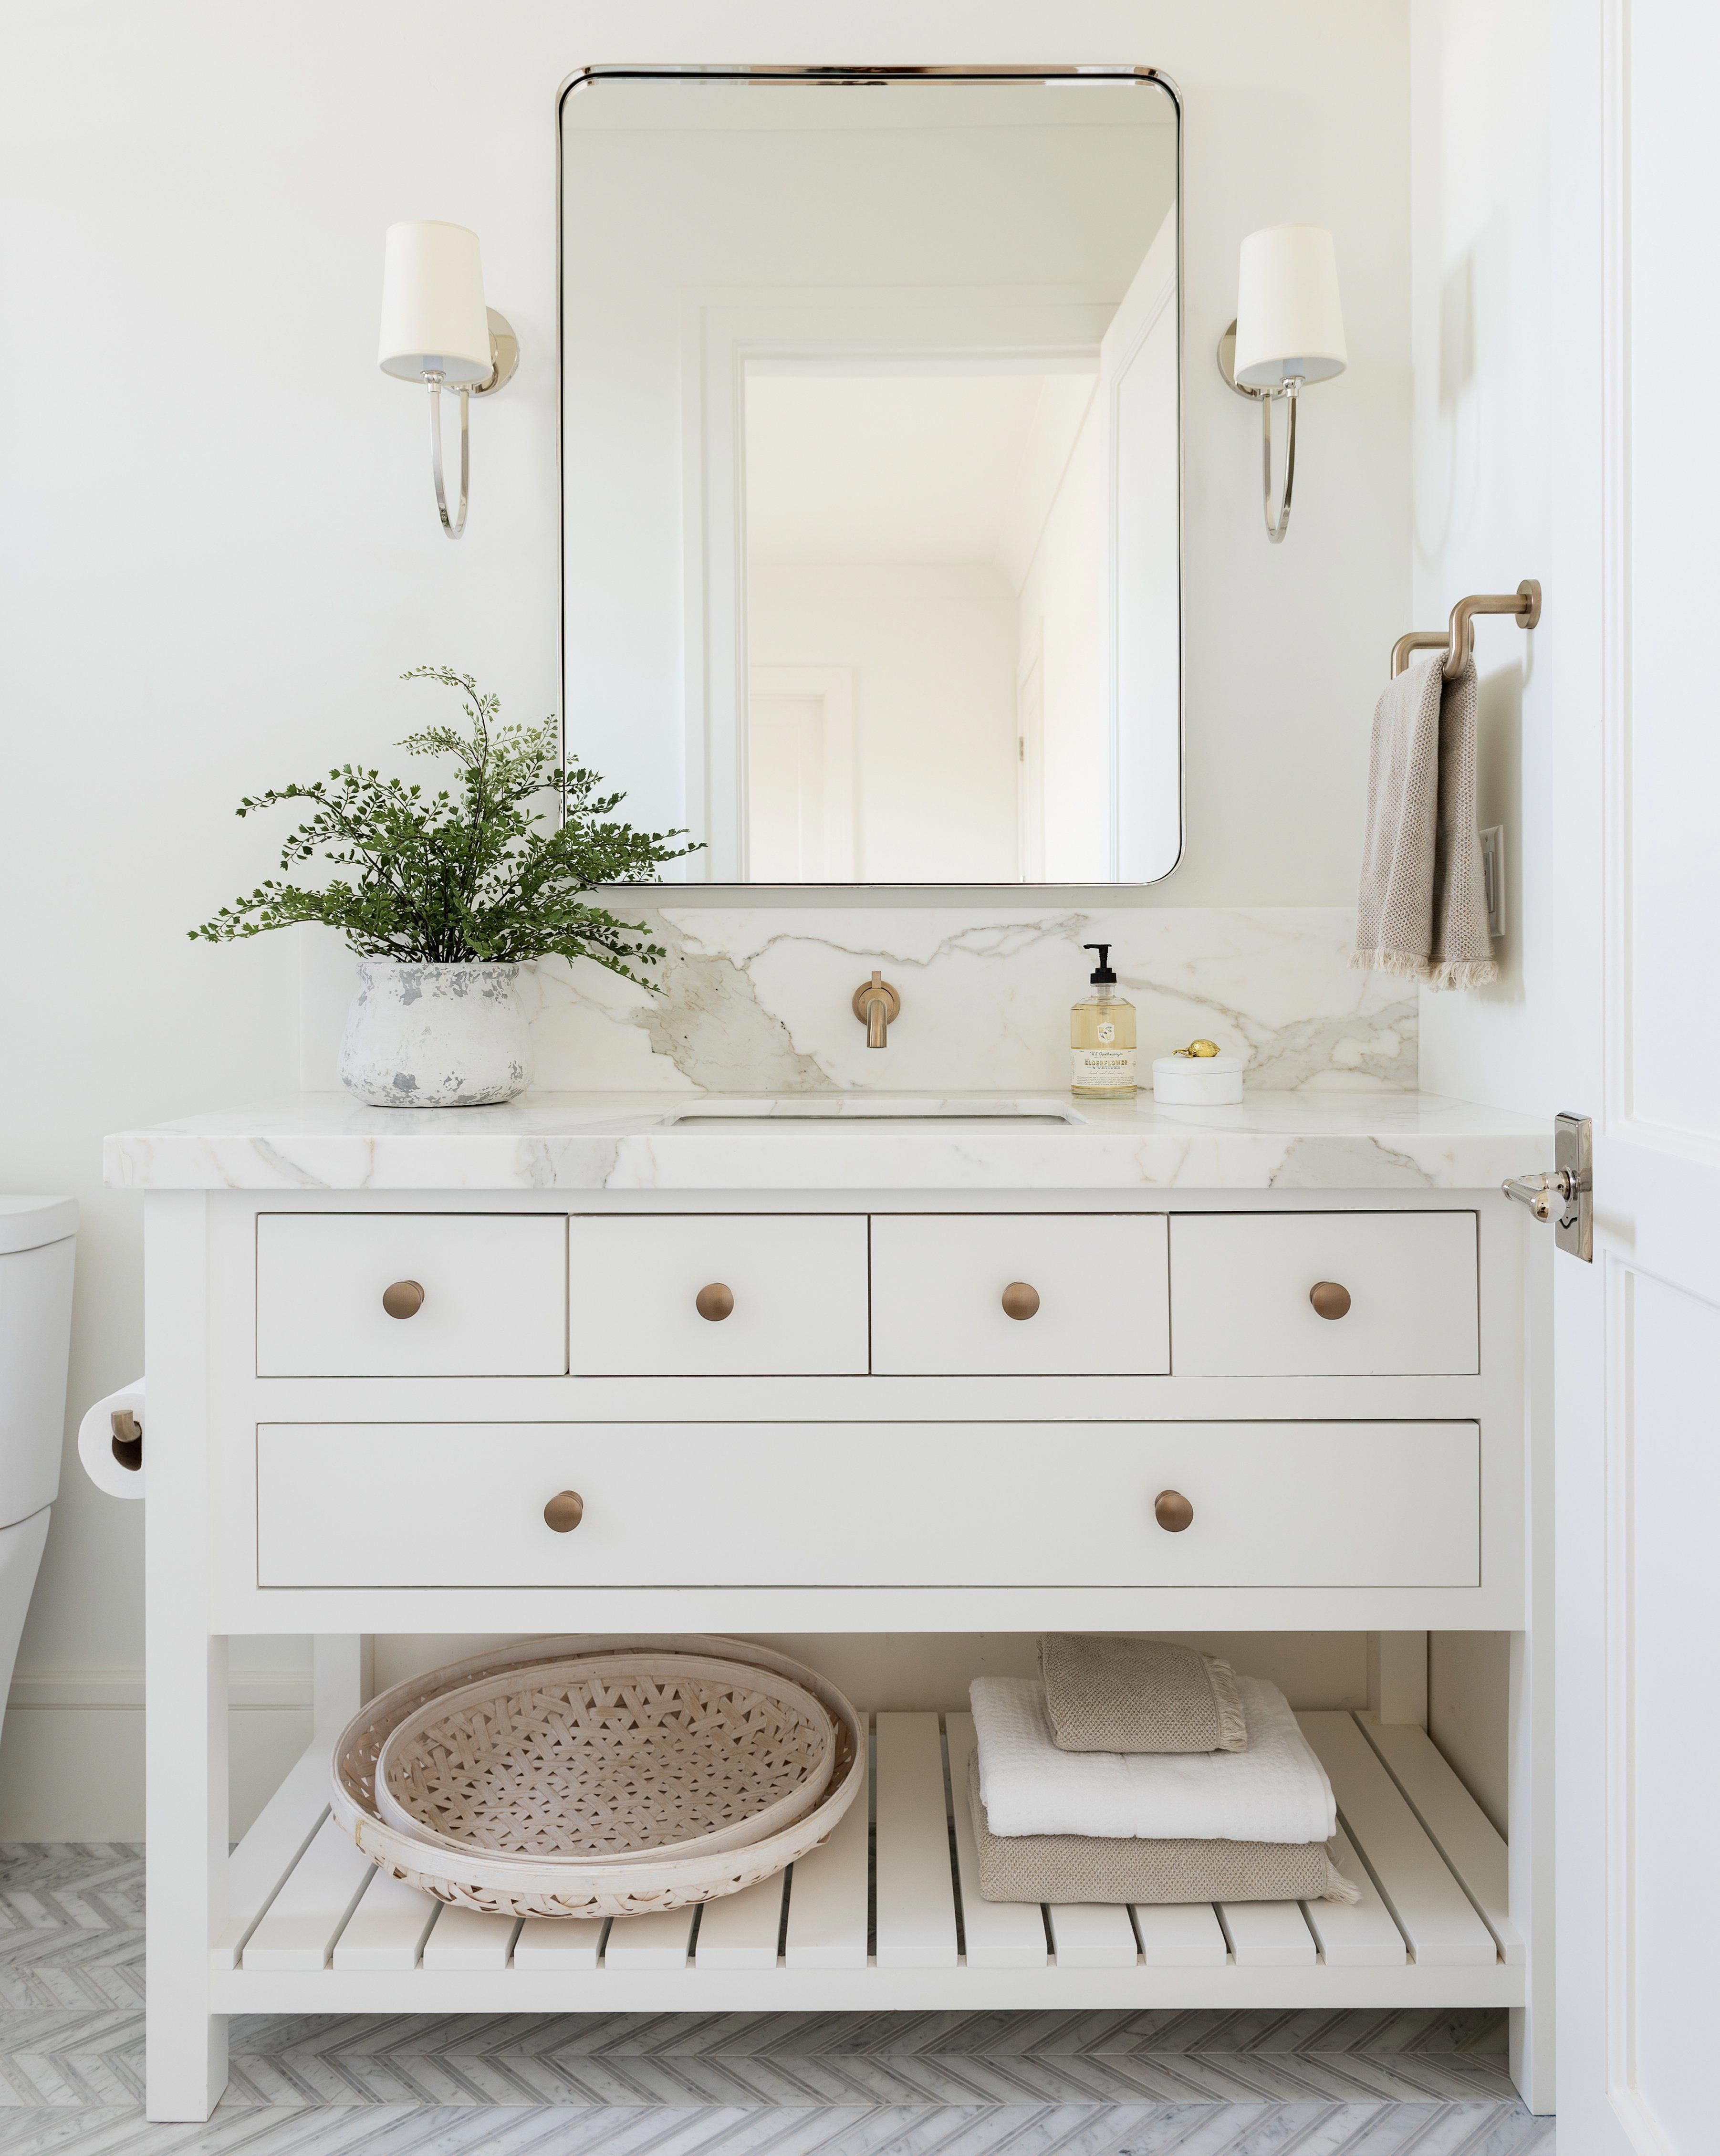 Reed Single Sconce Bathroom Interior Bathrooms Remodel Bathroom Inspiration